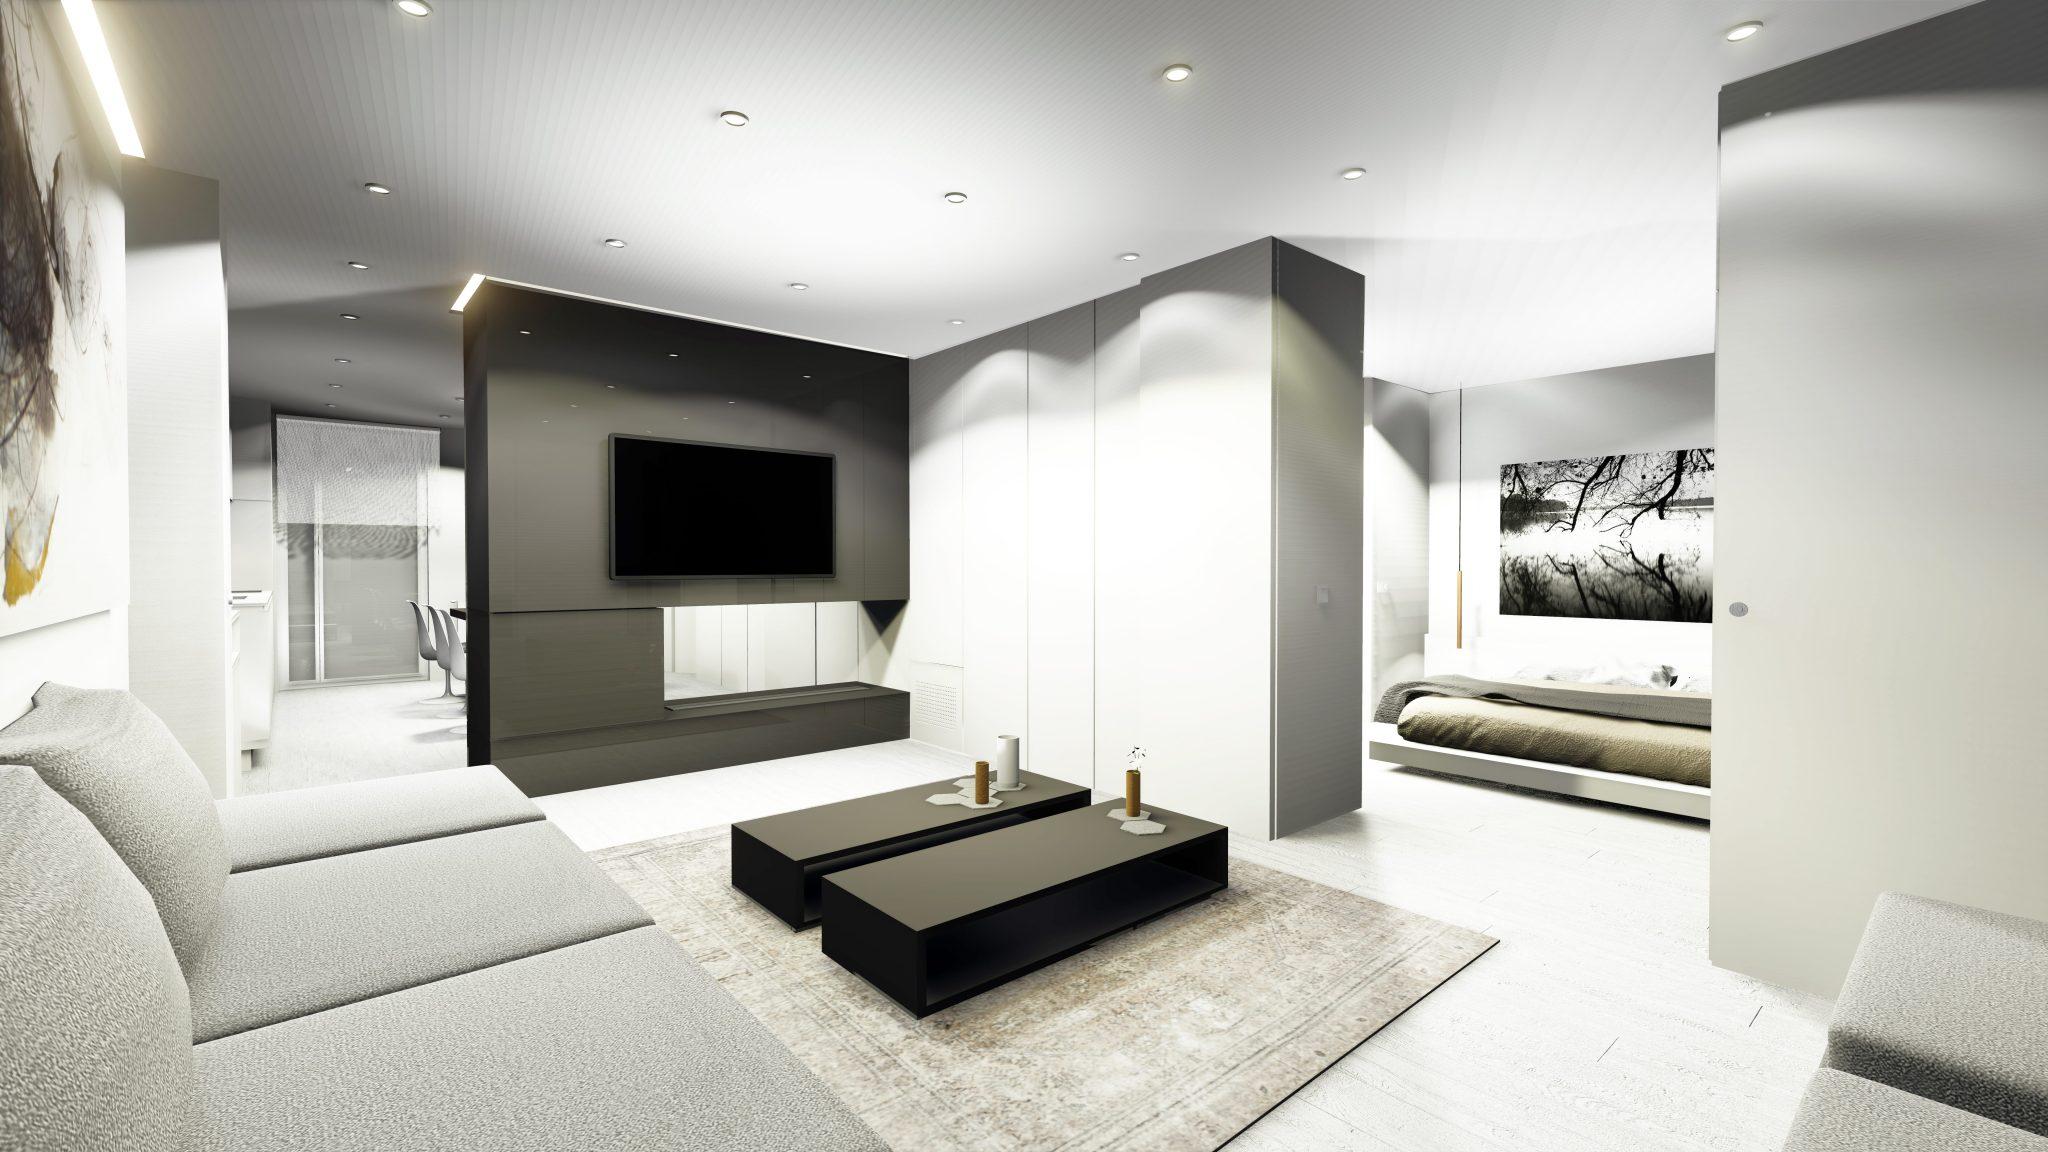 Arquitectura / Interiorismo / Ramón